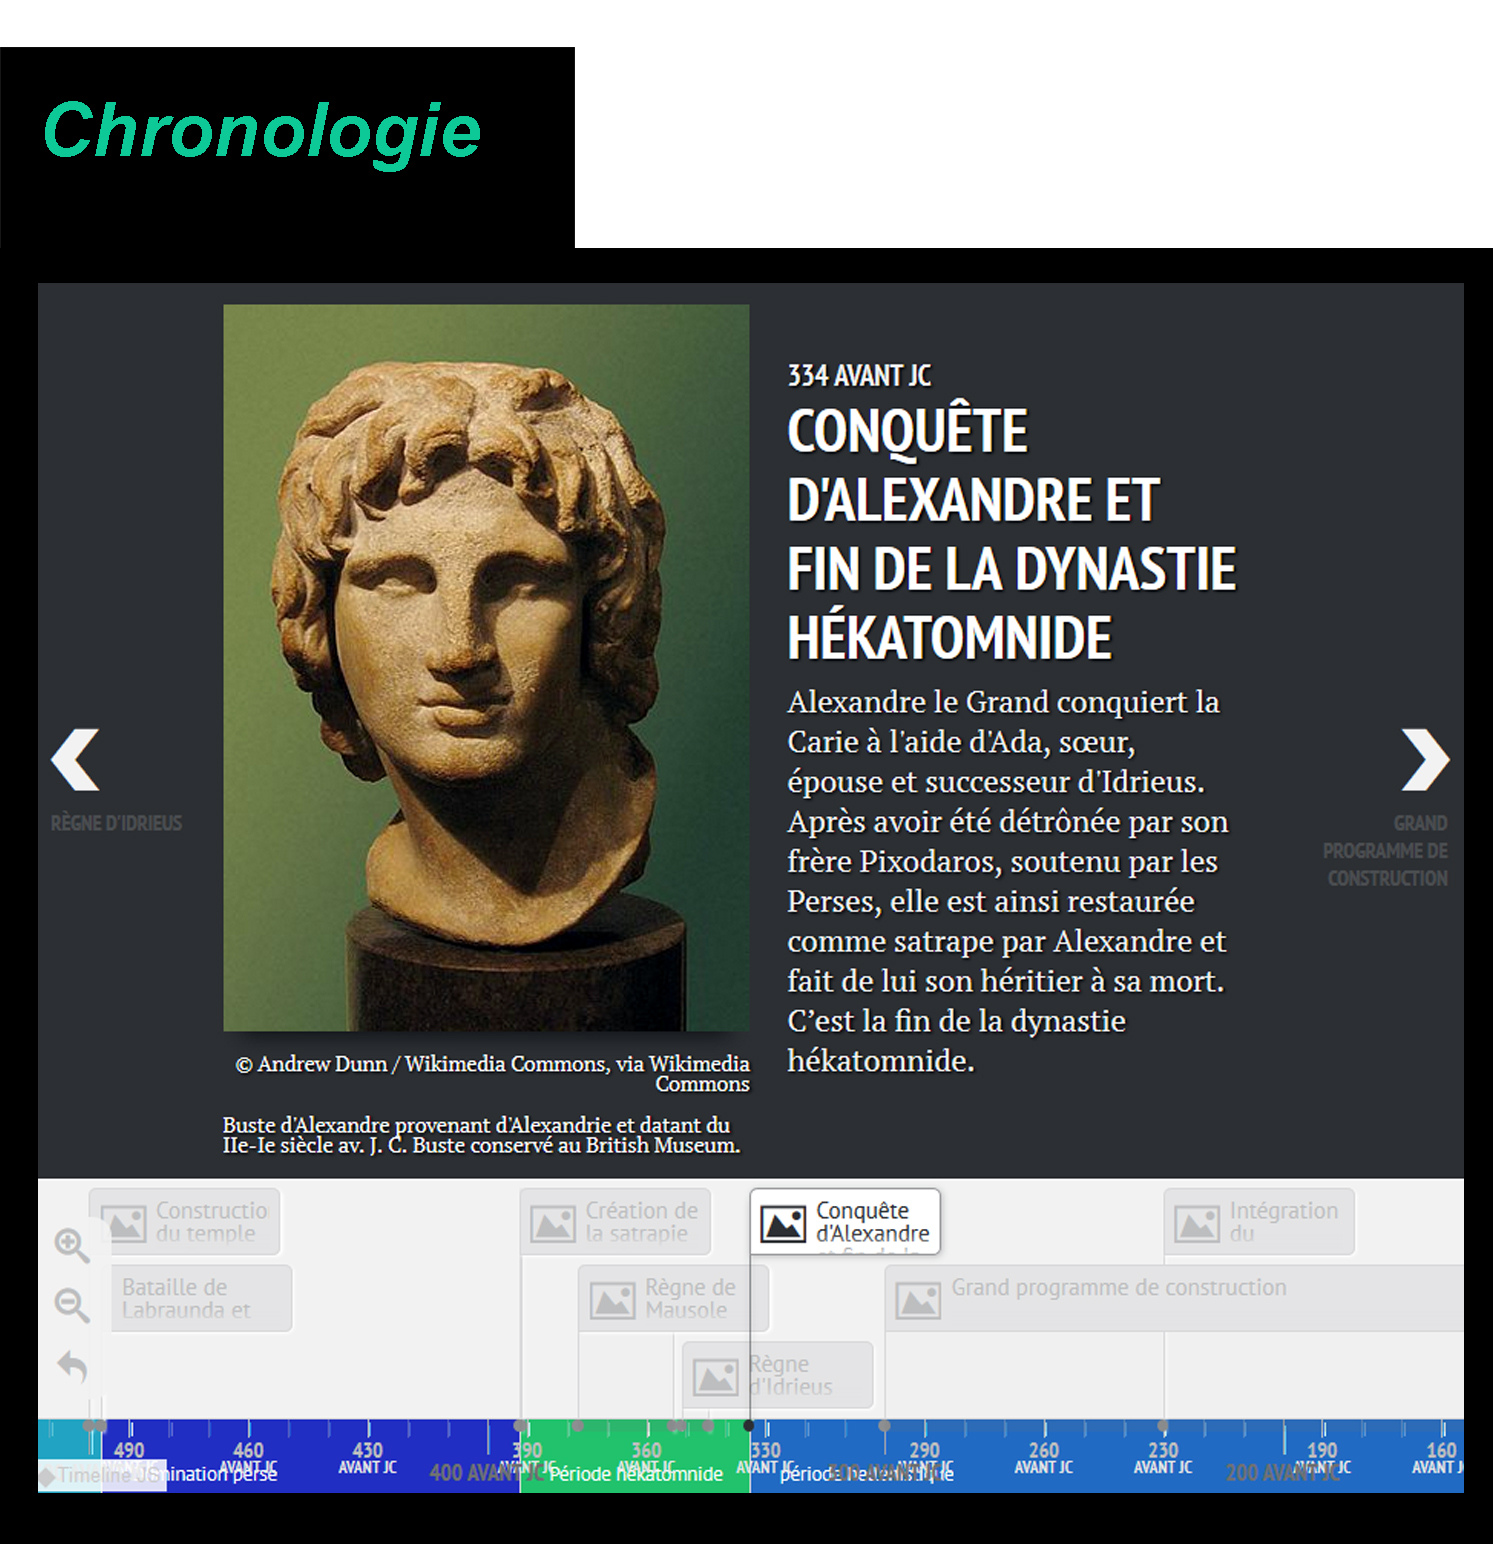 psl_psl-explore_labraunda_chronologie